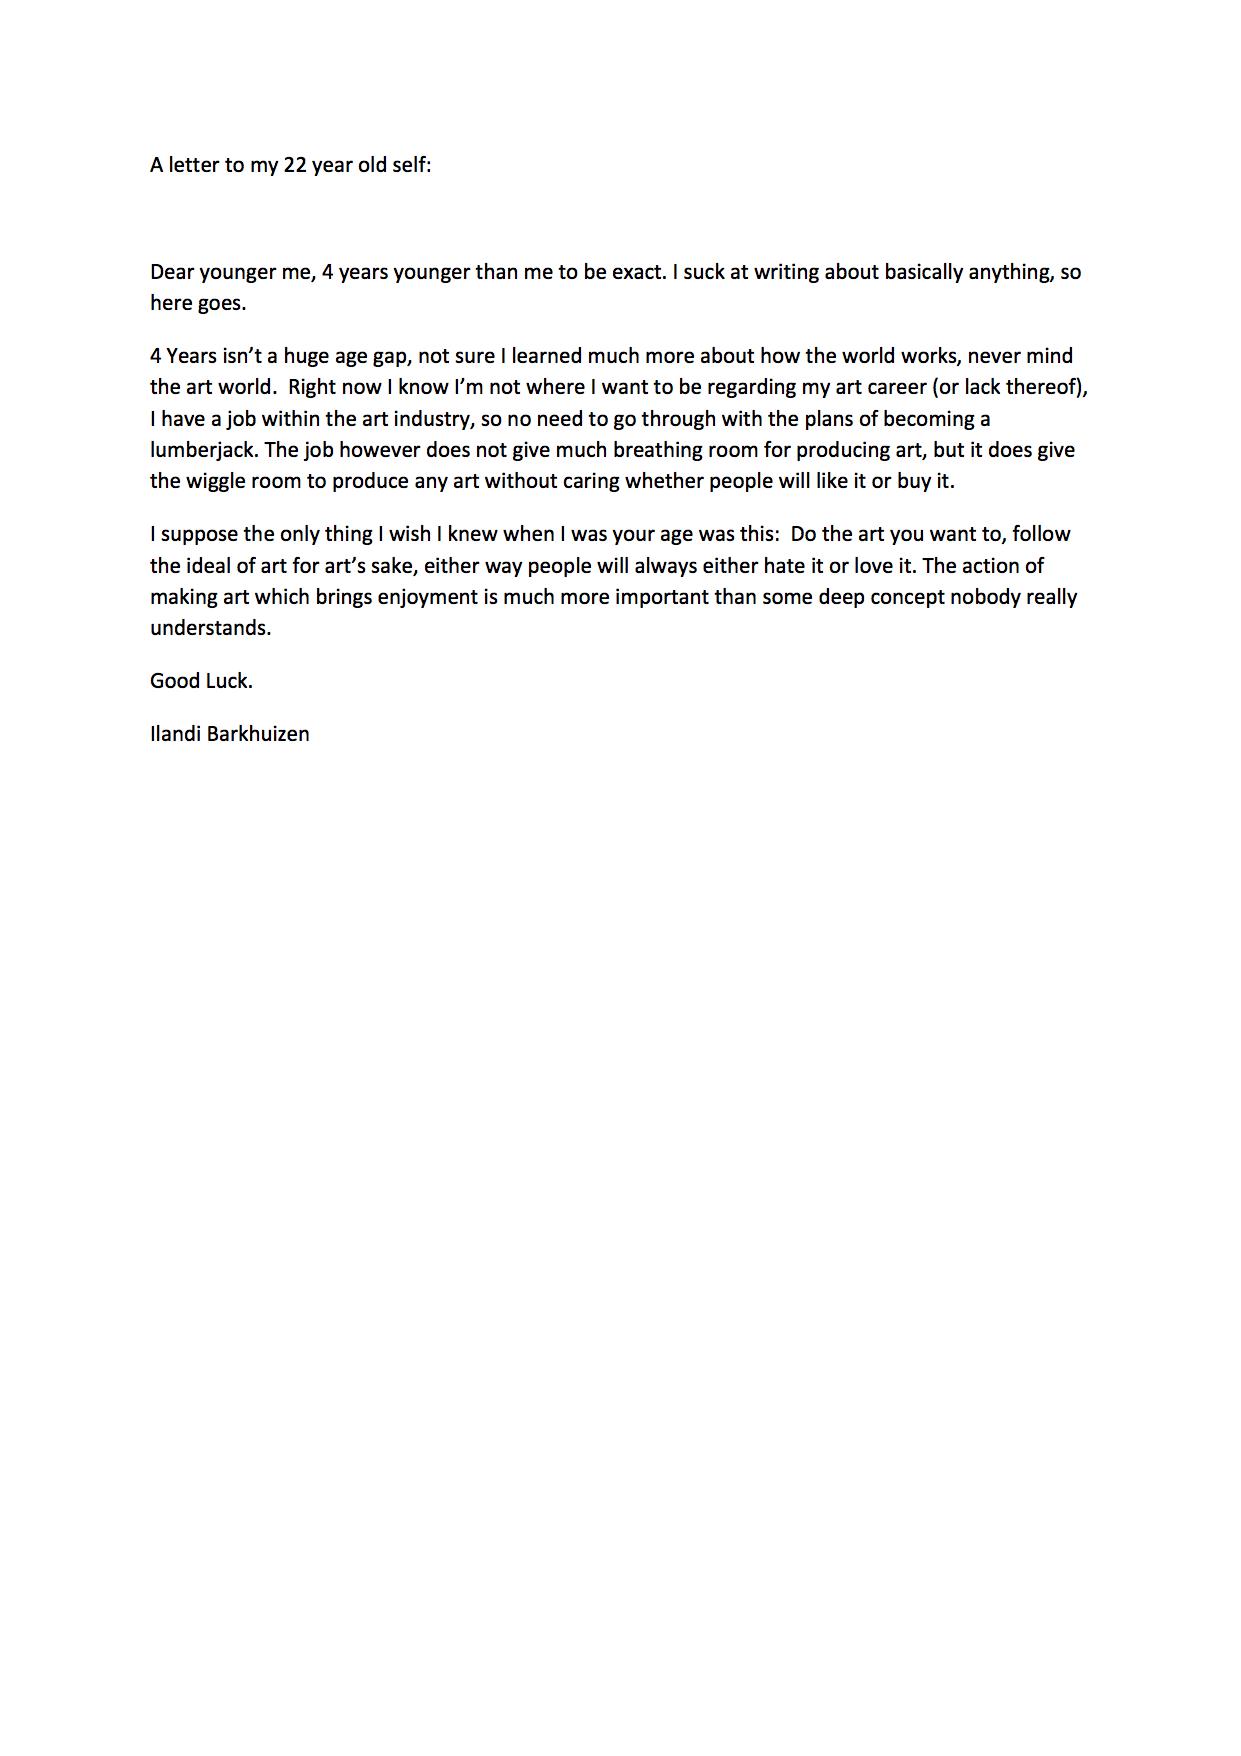 Ilandi Barkhuizen_s Letter .jpg